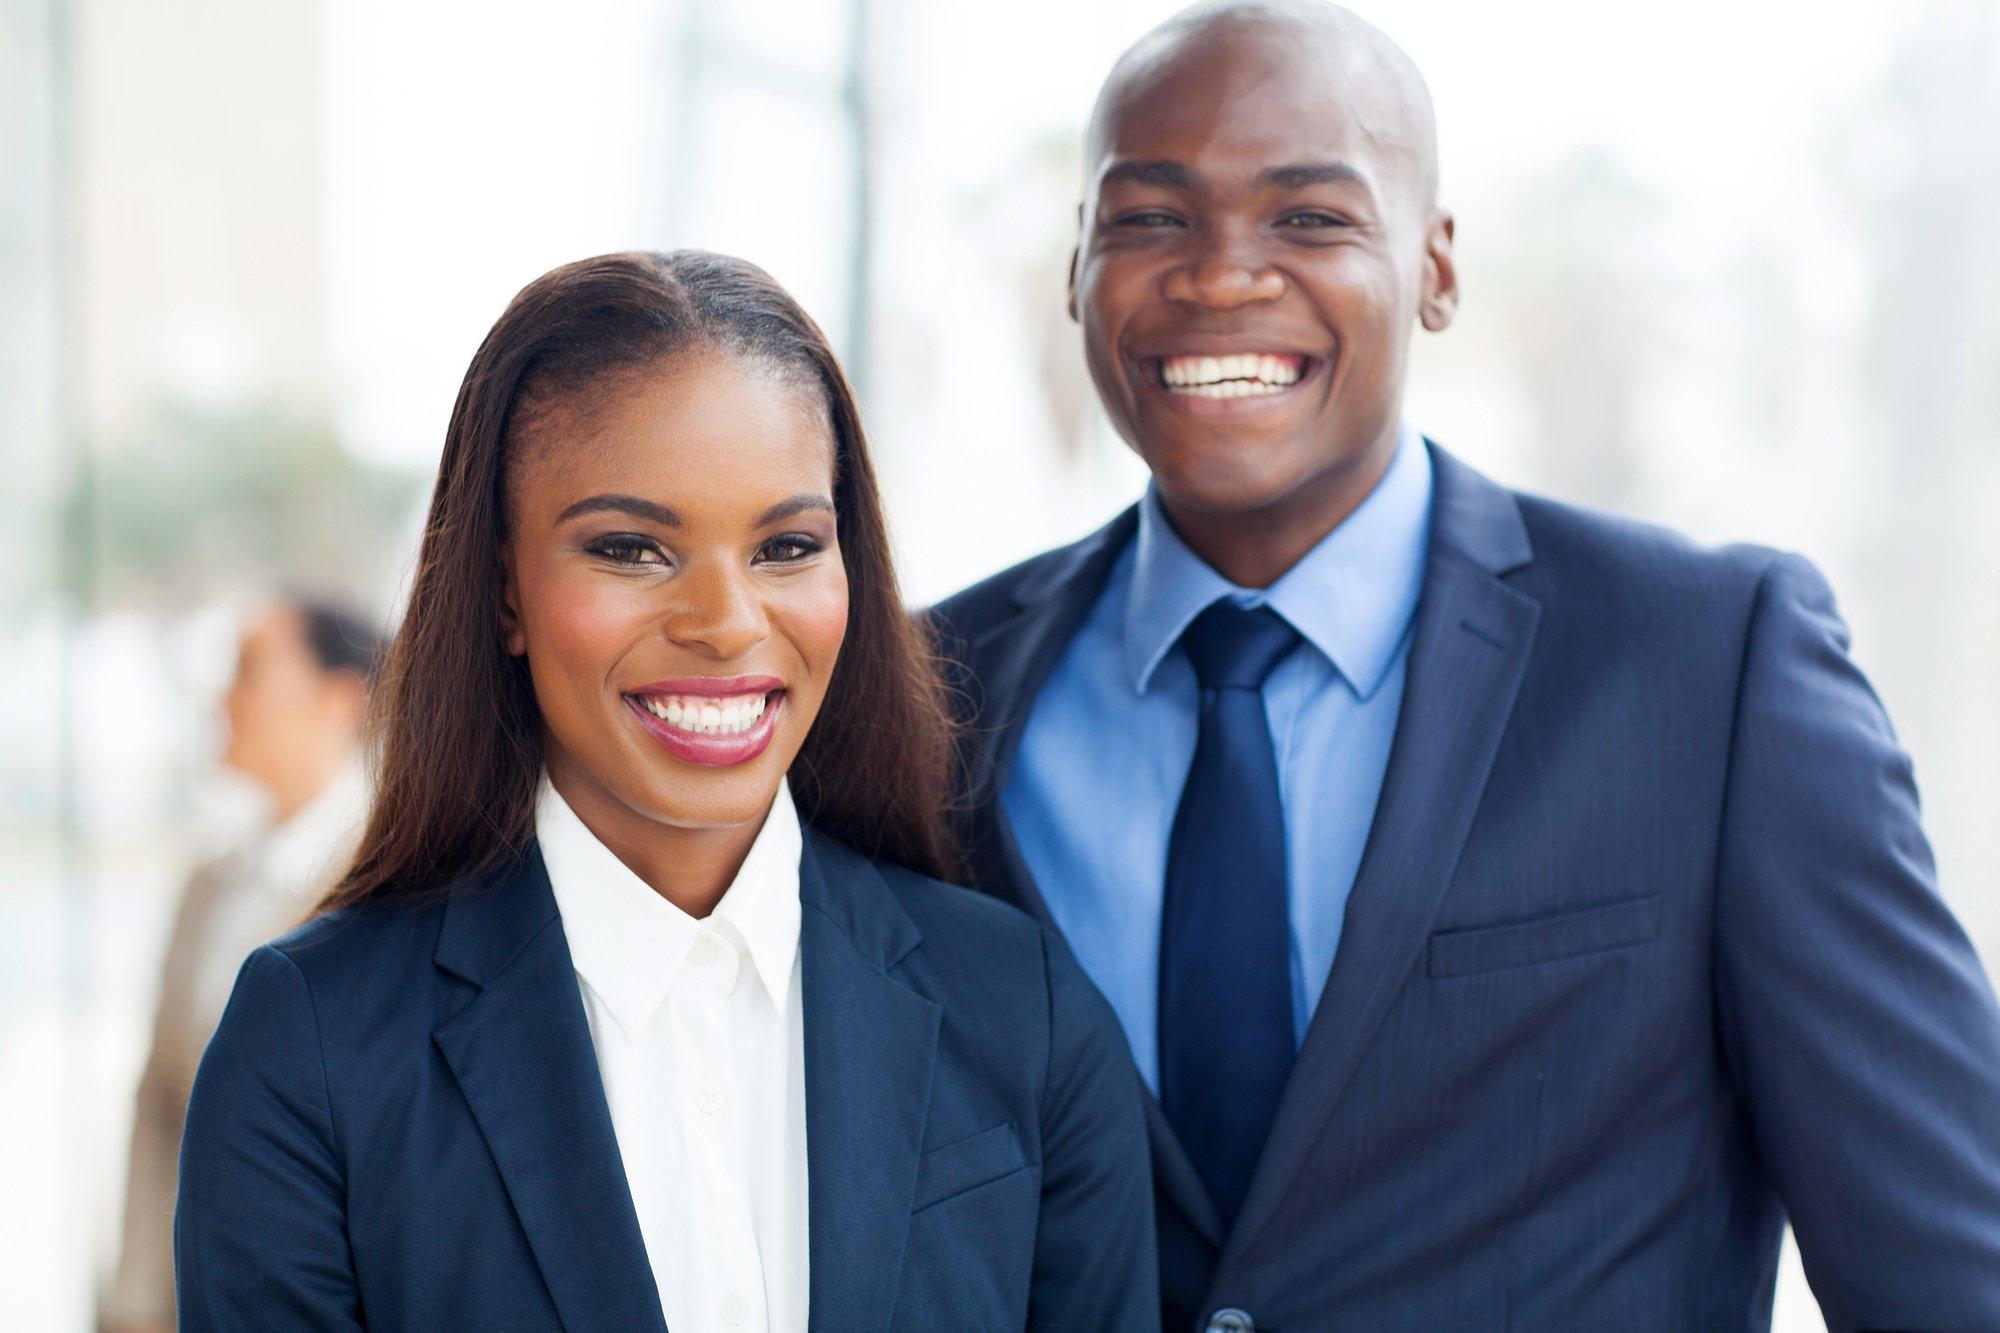 African business team portrait